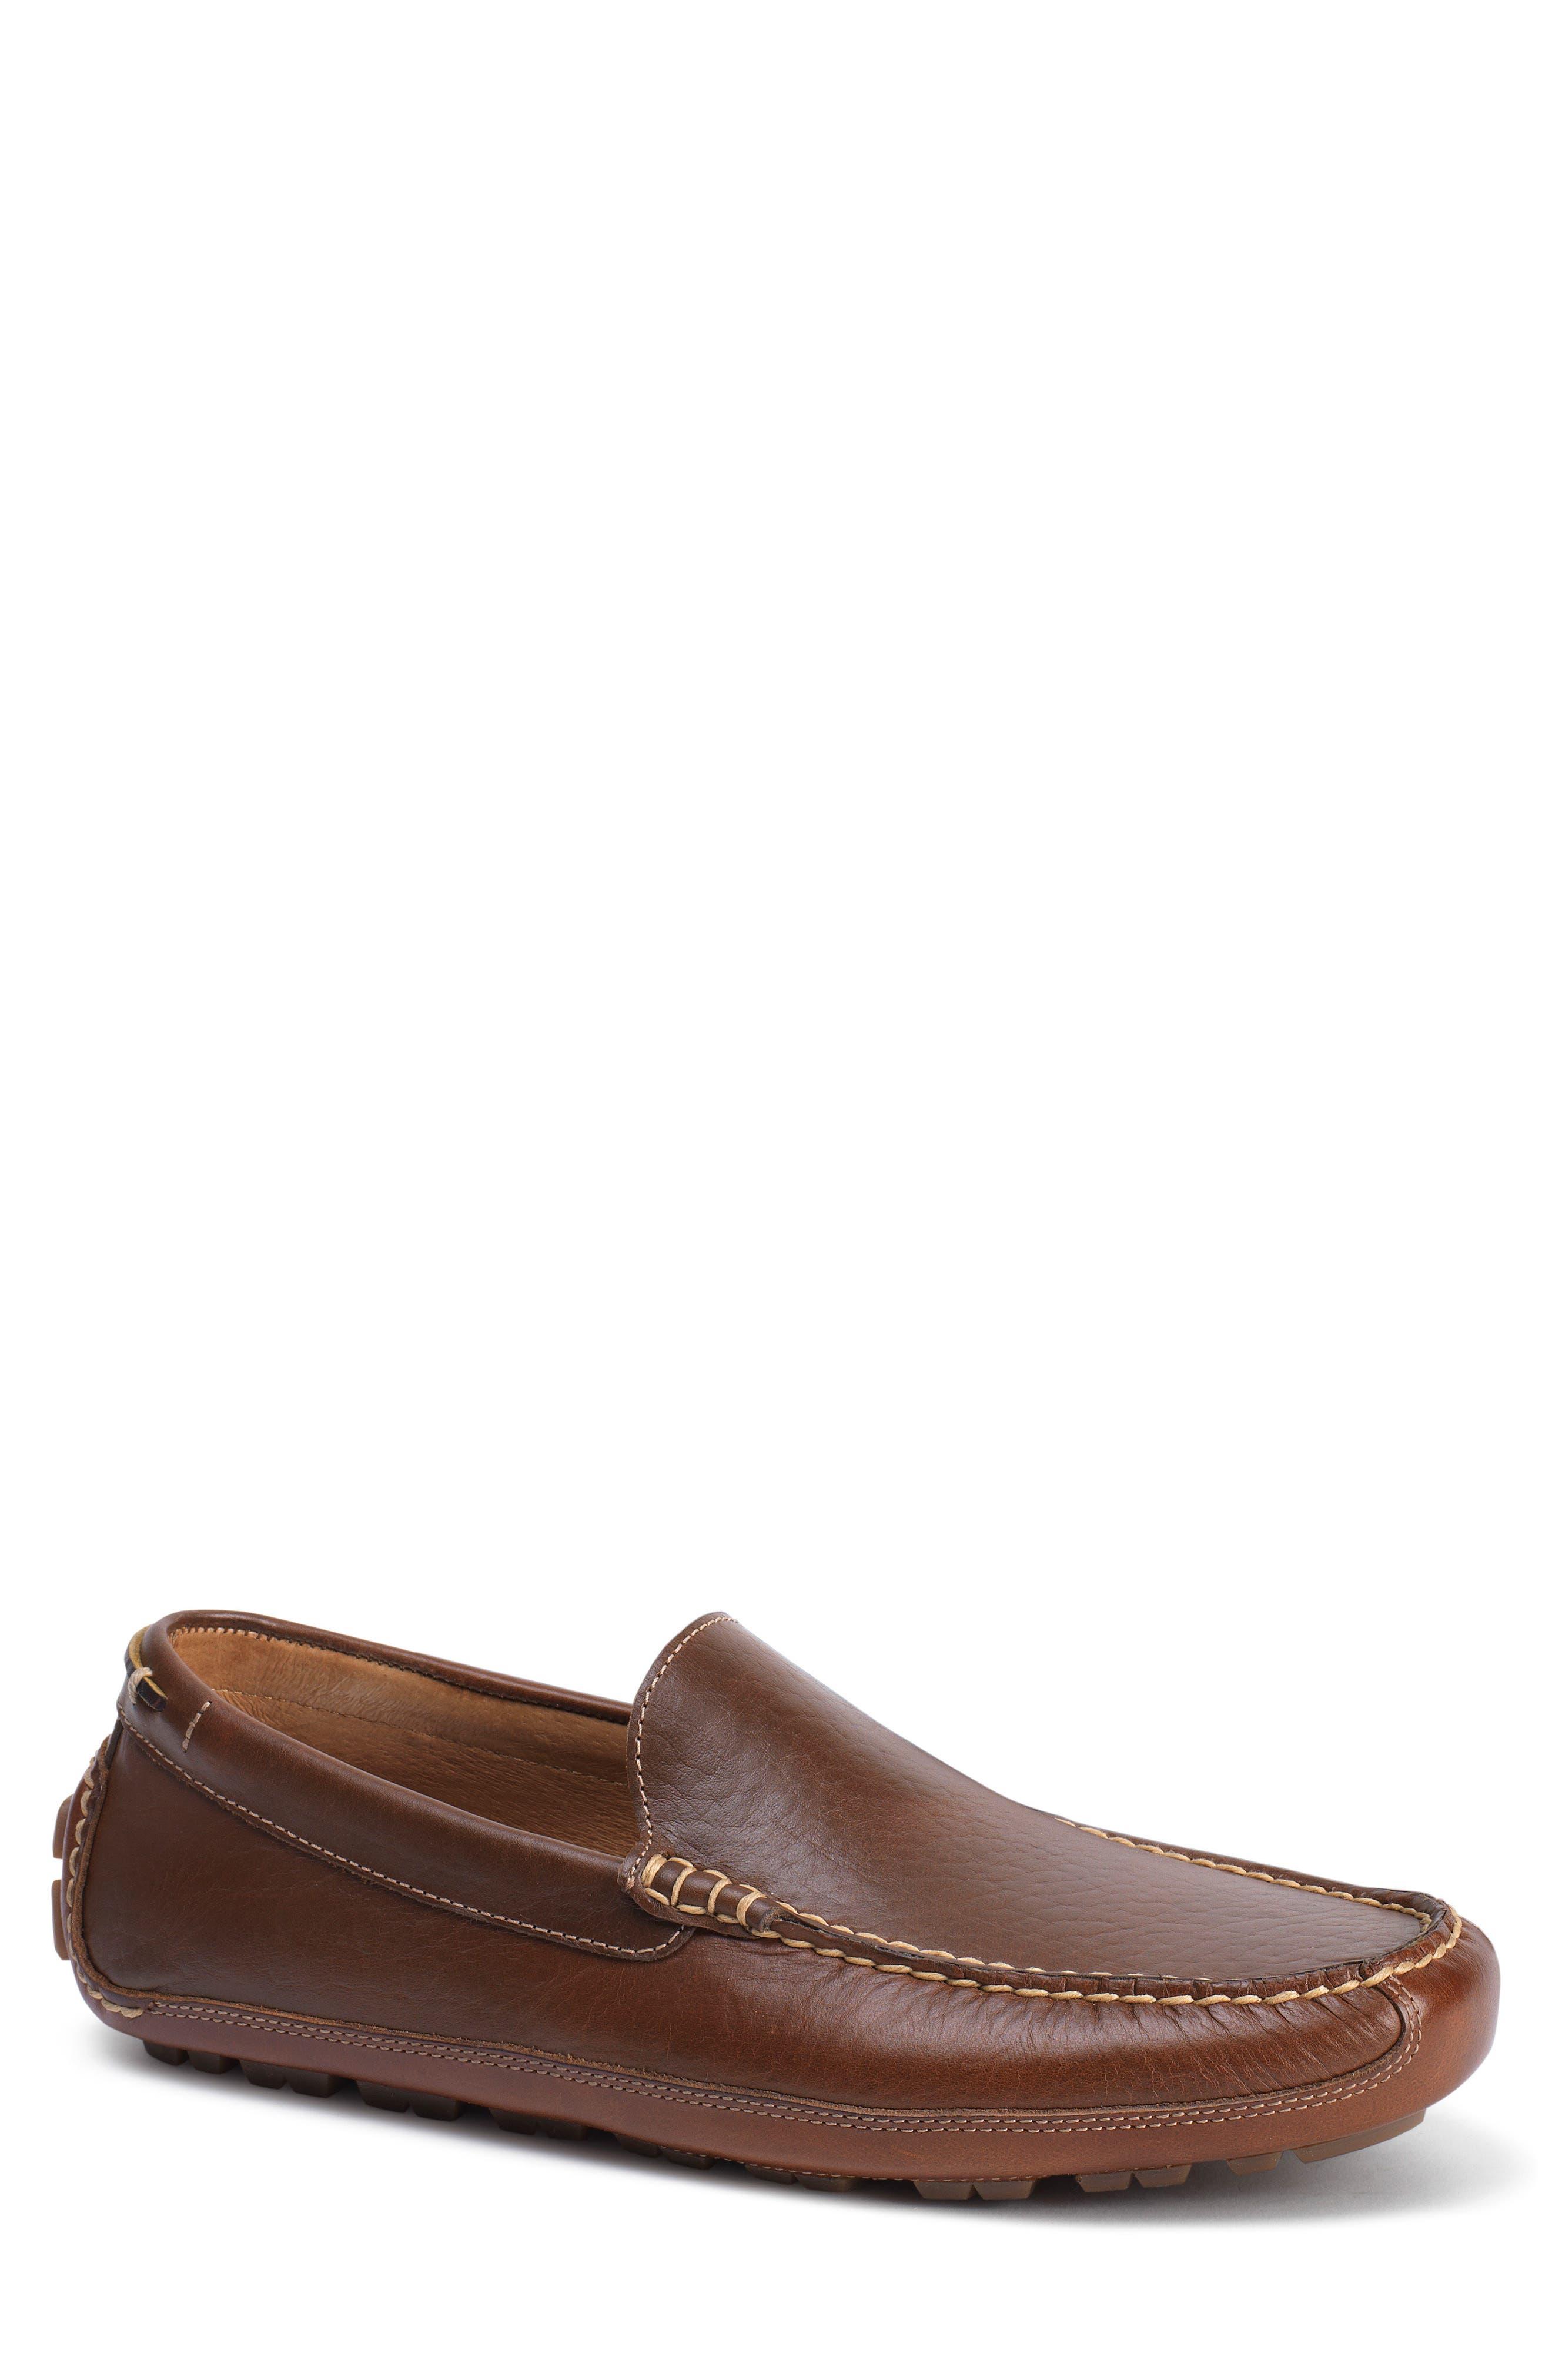 Dean Driving Shoe,                         Main,                         color, Saddle Tan Leather